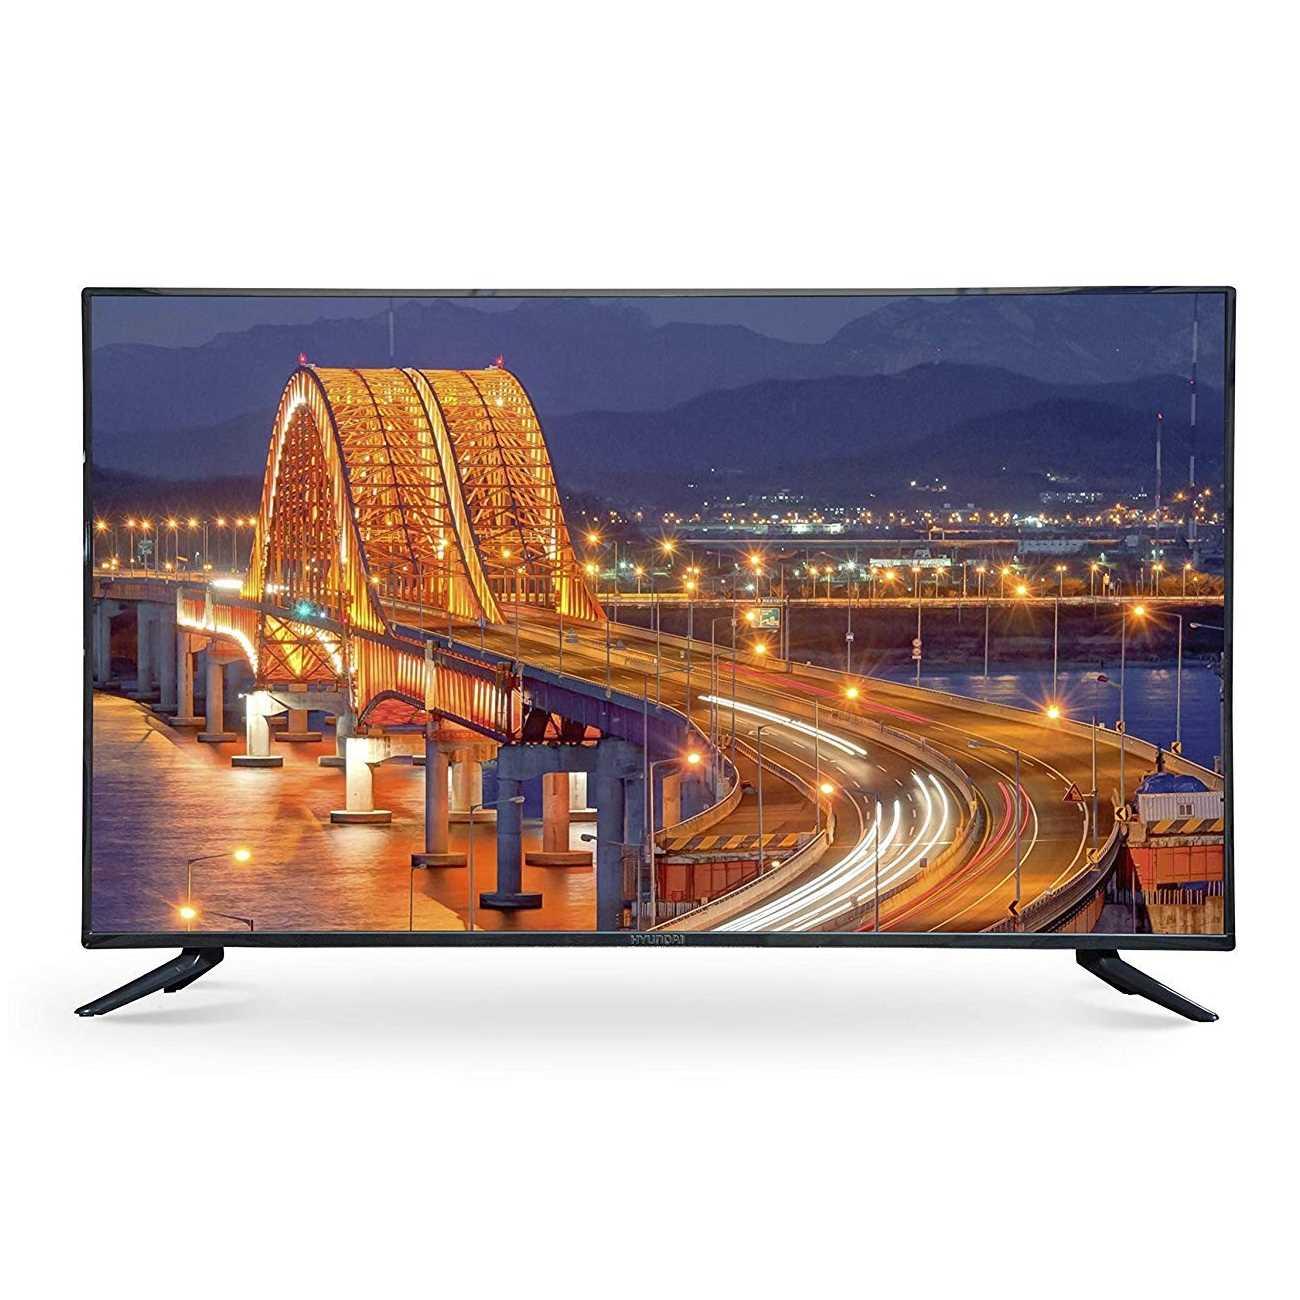 Hyundai HY3285HH36 32 Inch HD Ready Smart LED Television